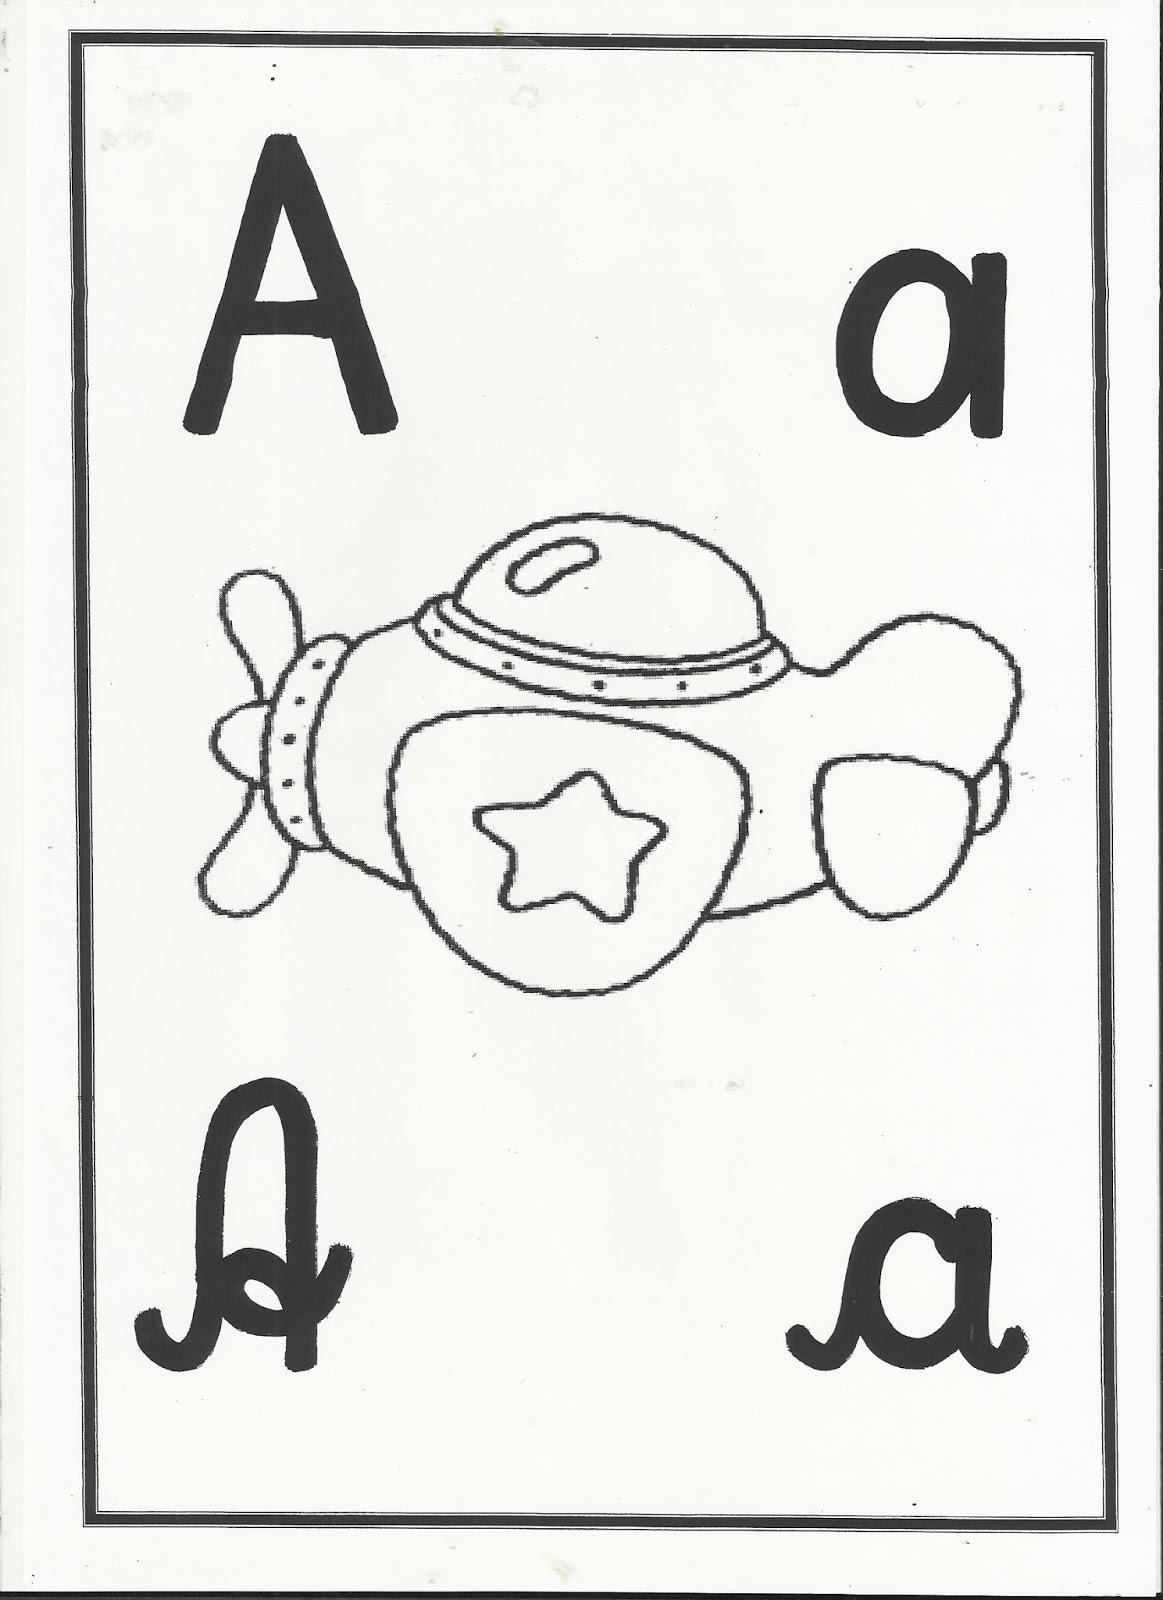 Profª Ivani Ferreira Alfabeto Para Imprimir E Colorir 4 Letras